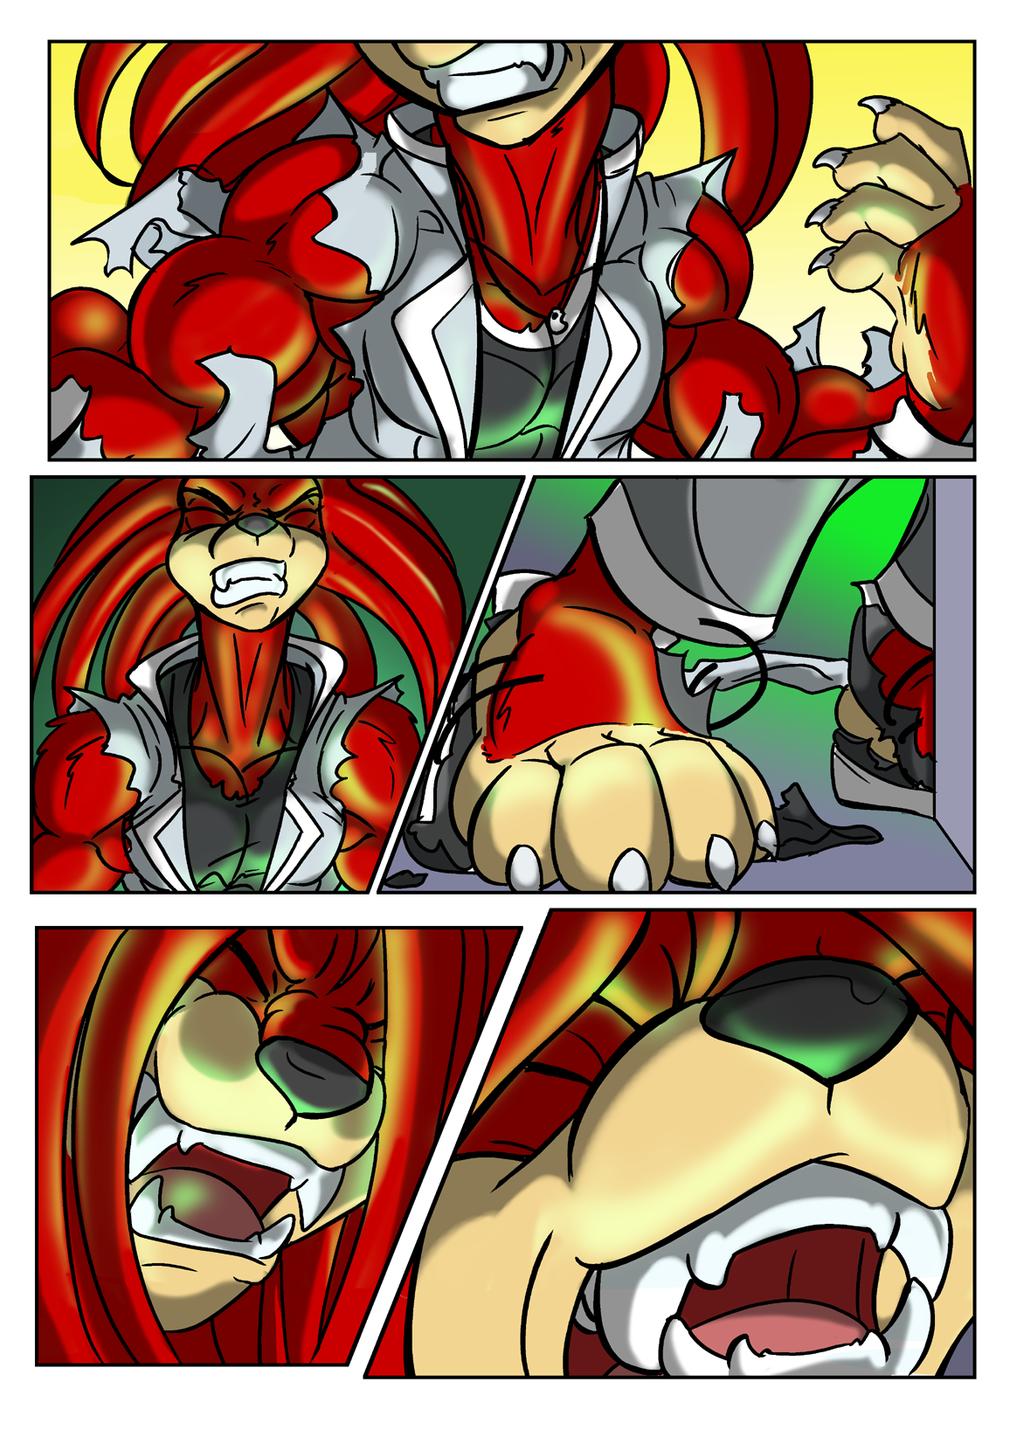 Knuckles TF Comic 03 - By Blackrat